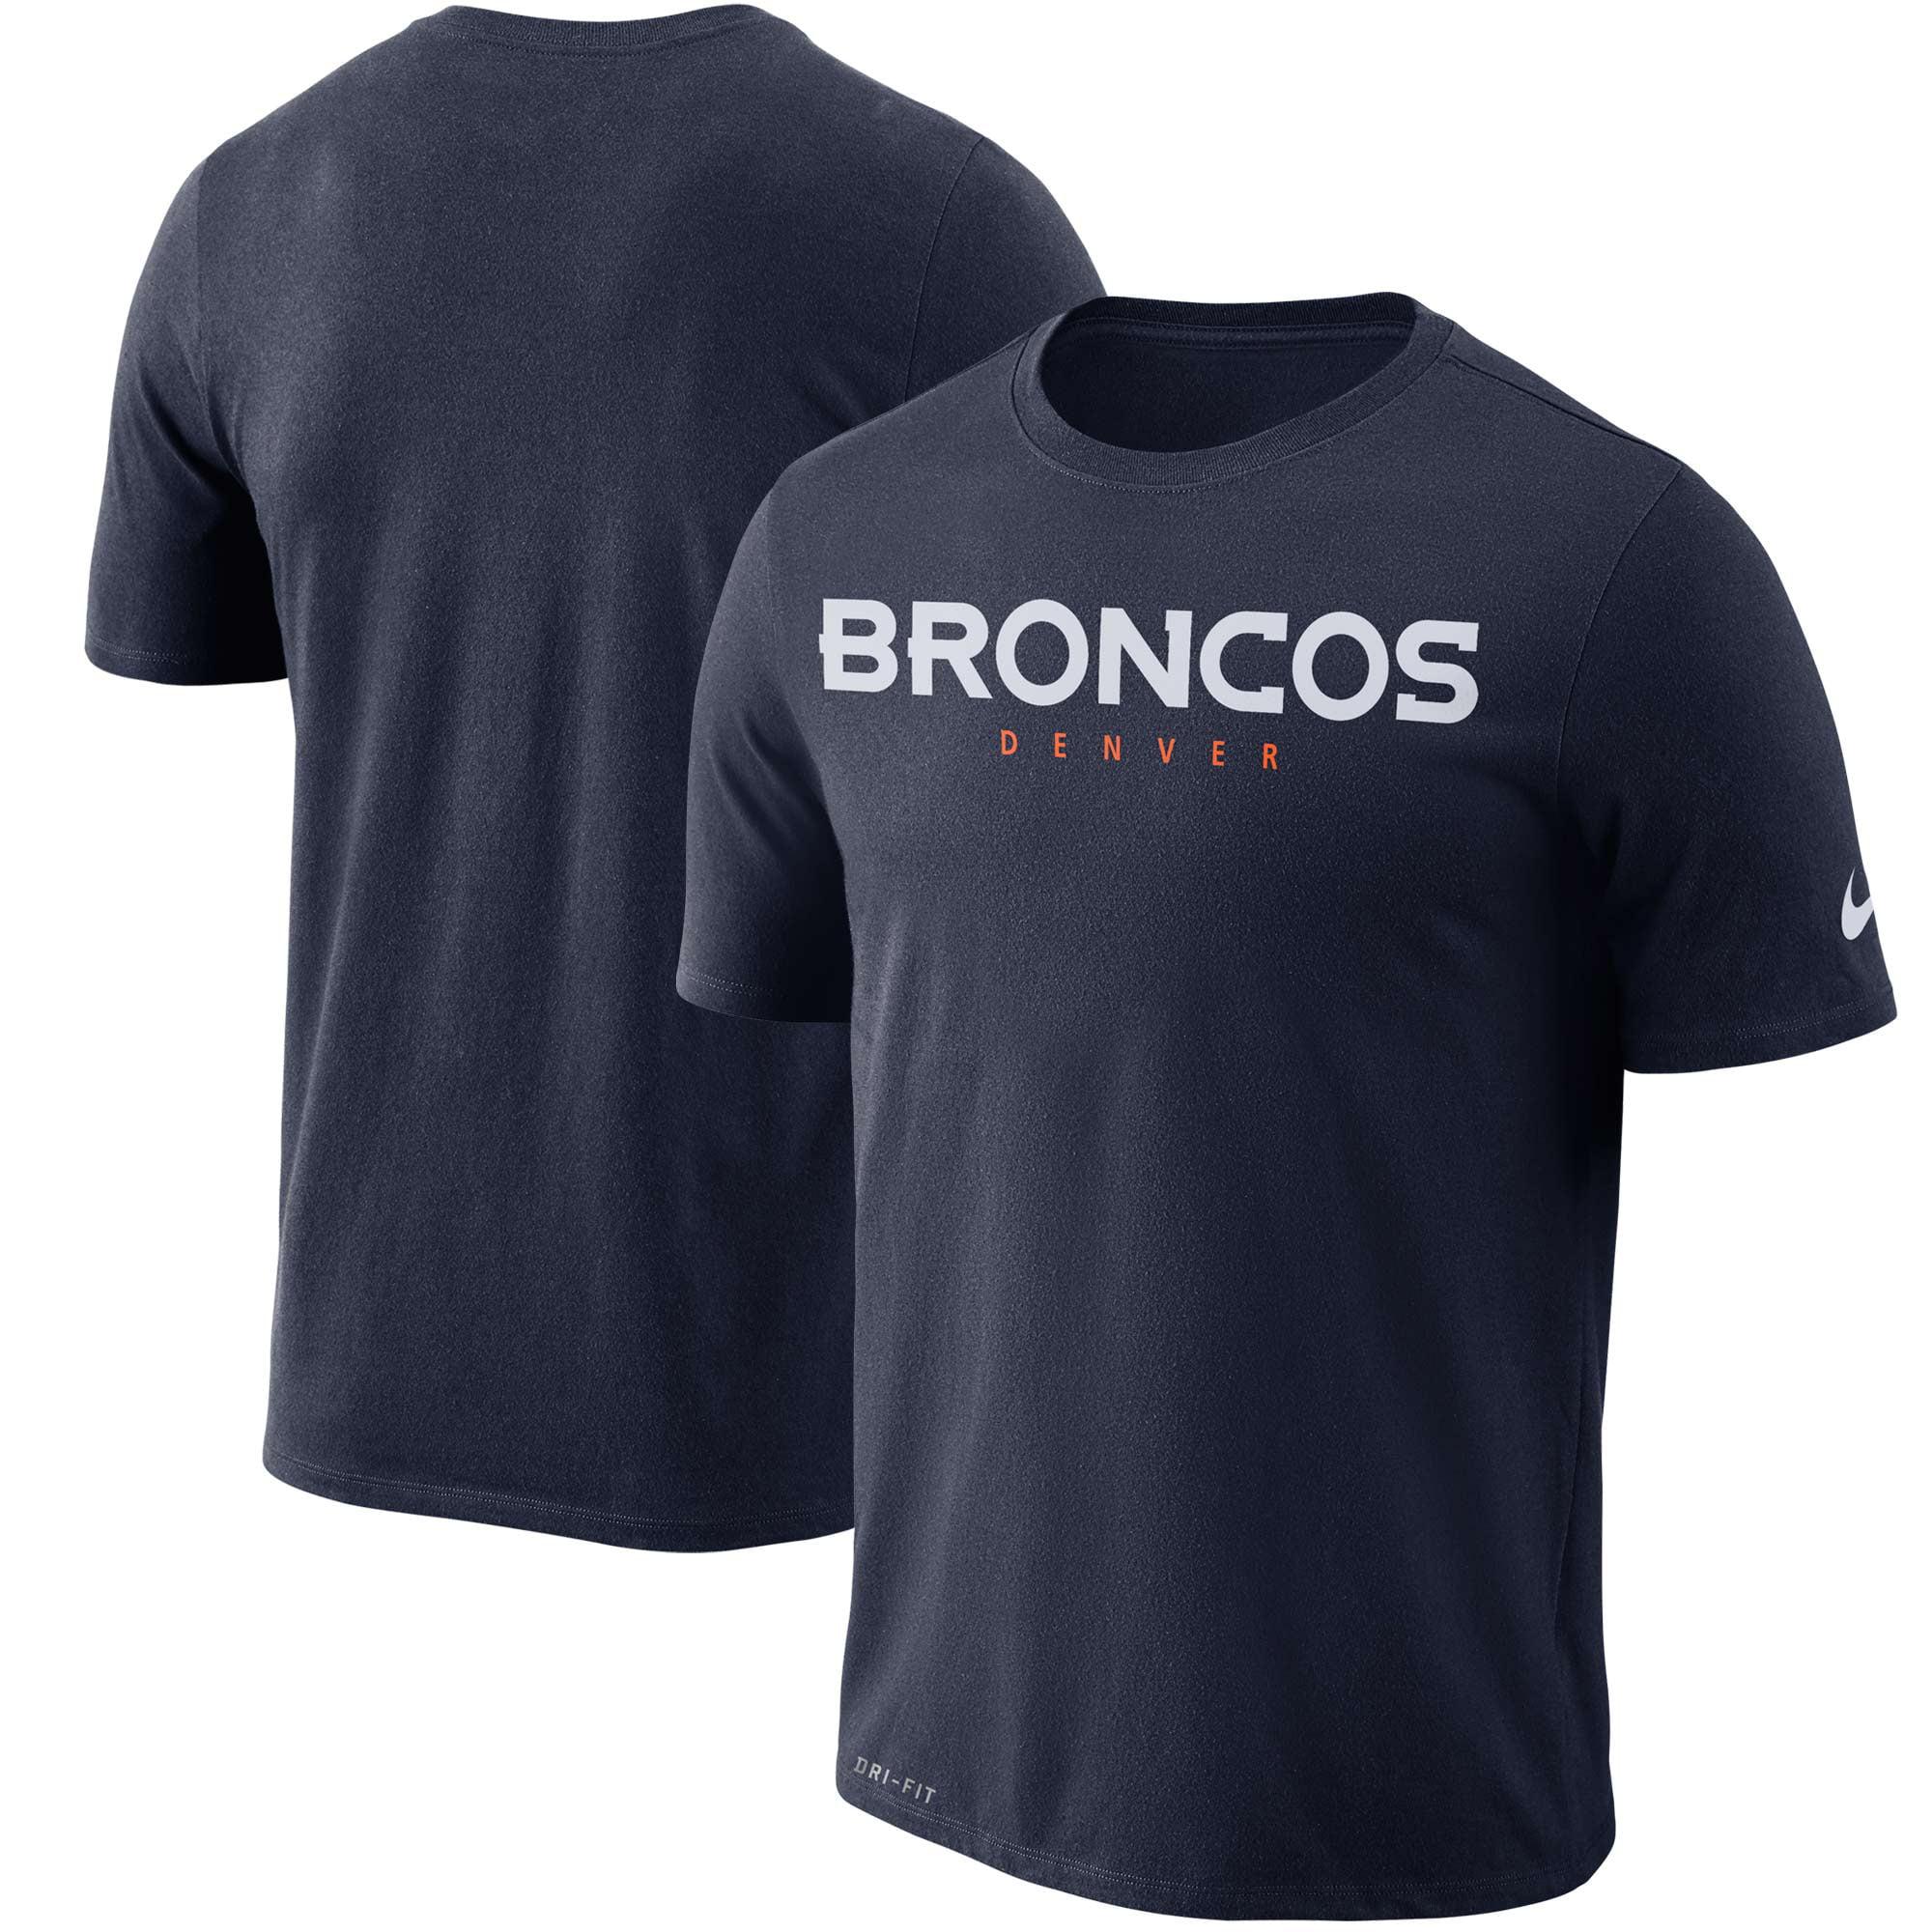 Denver Broncos Nike Dri-FIT Cotton Essential Wordmark T-Shirt - Navy